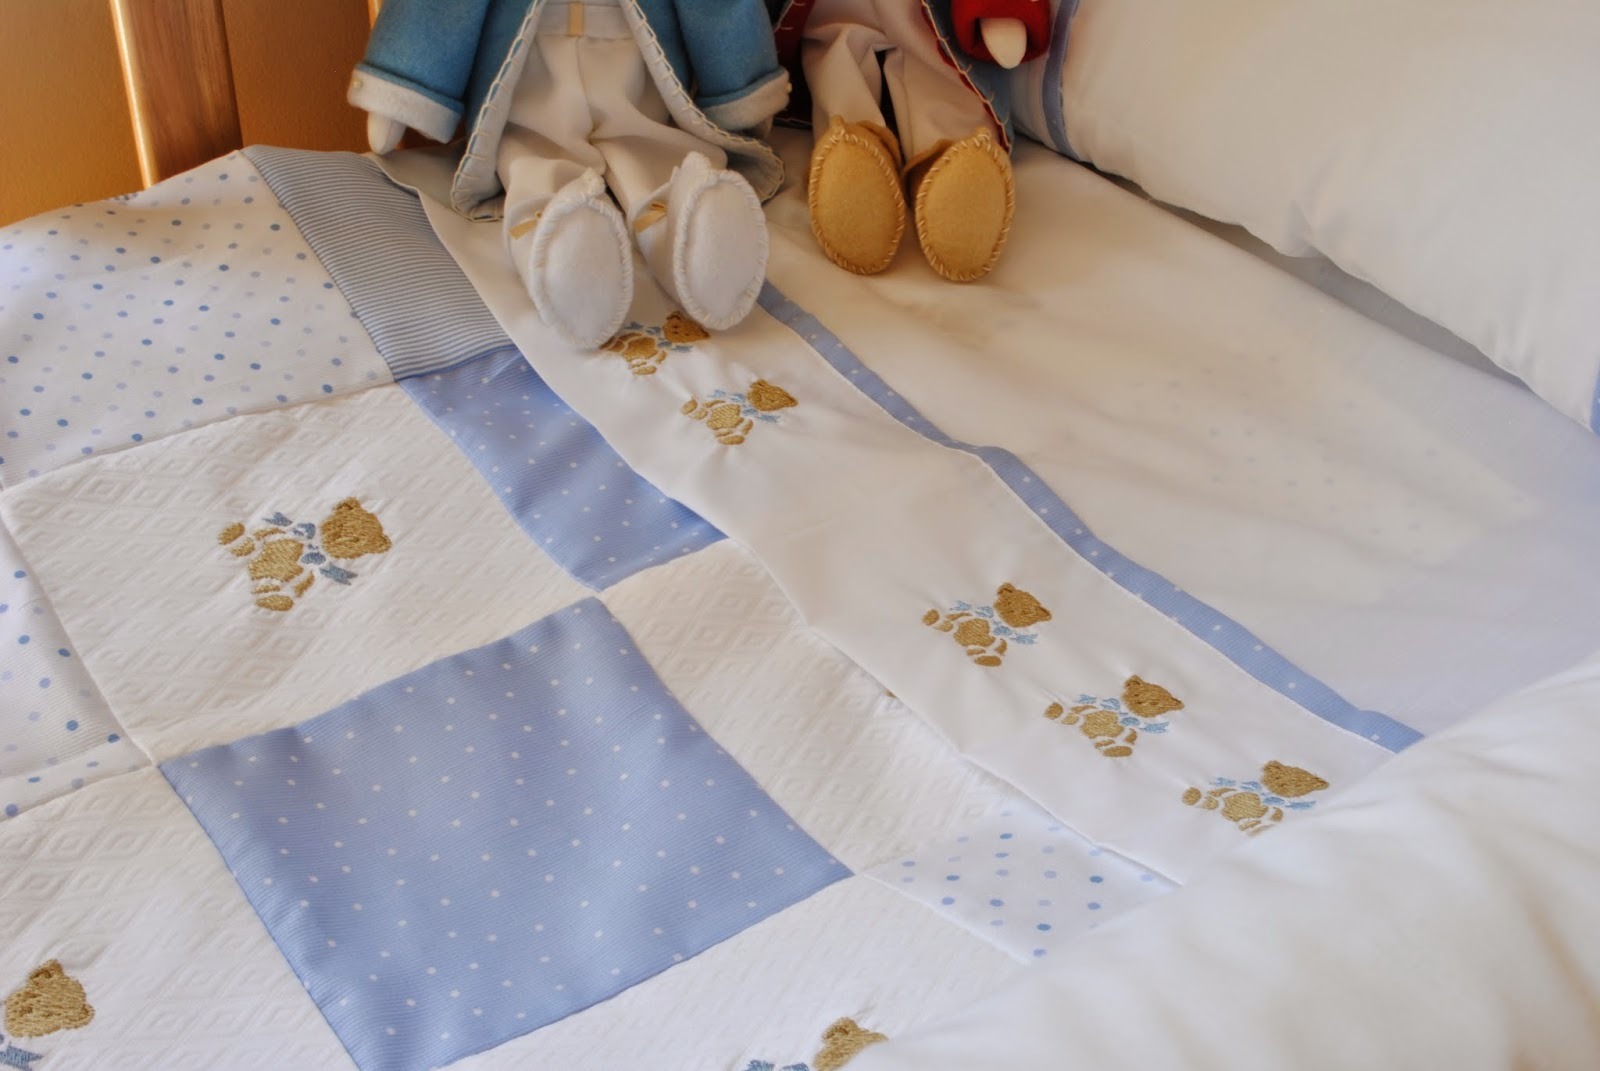 Paz montealegre decoraci n s banas bordadas para ni os - Sabanas para bebes ...